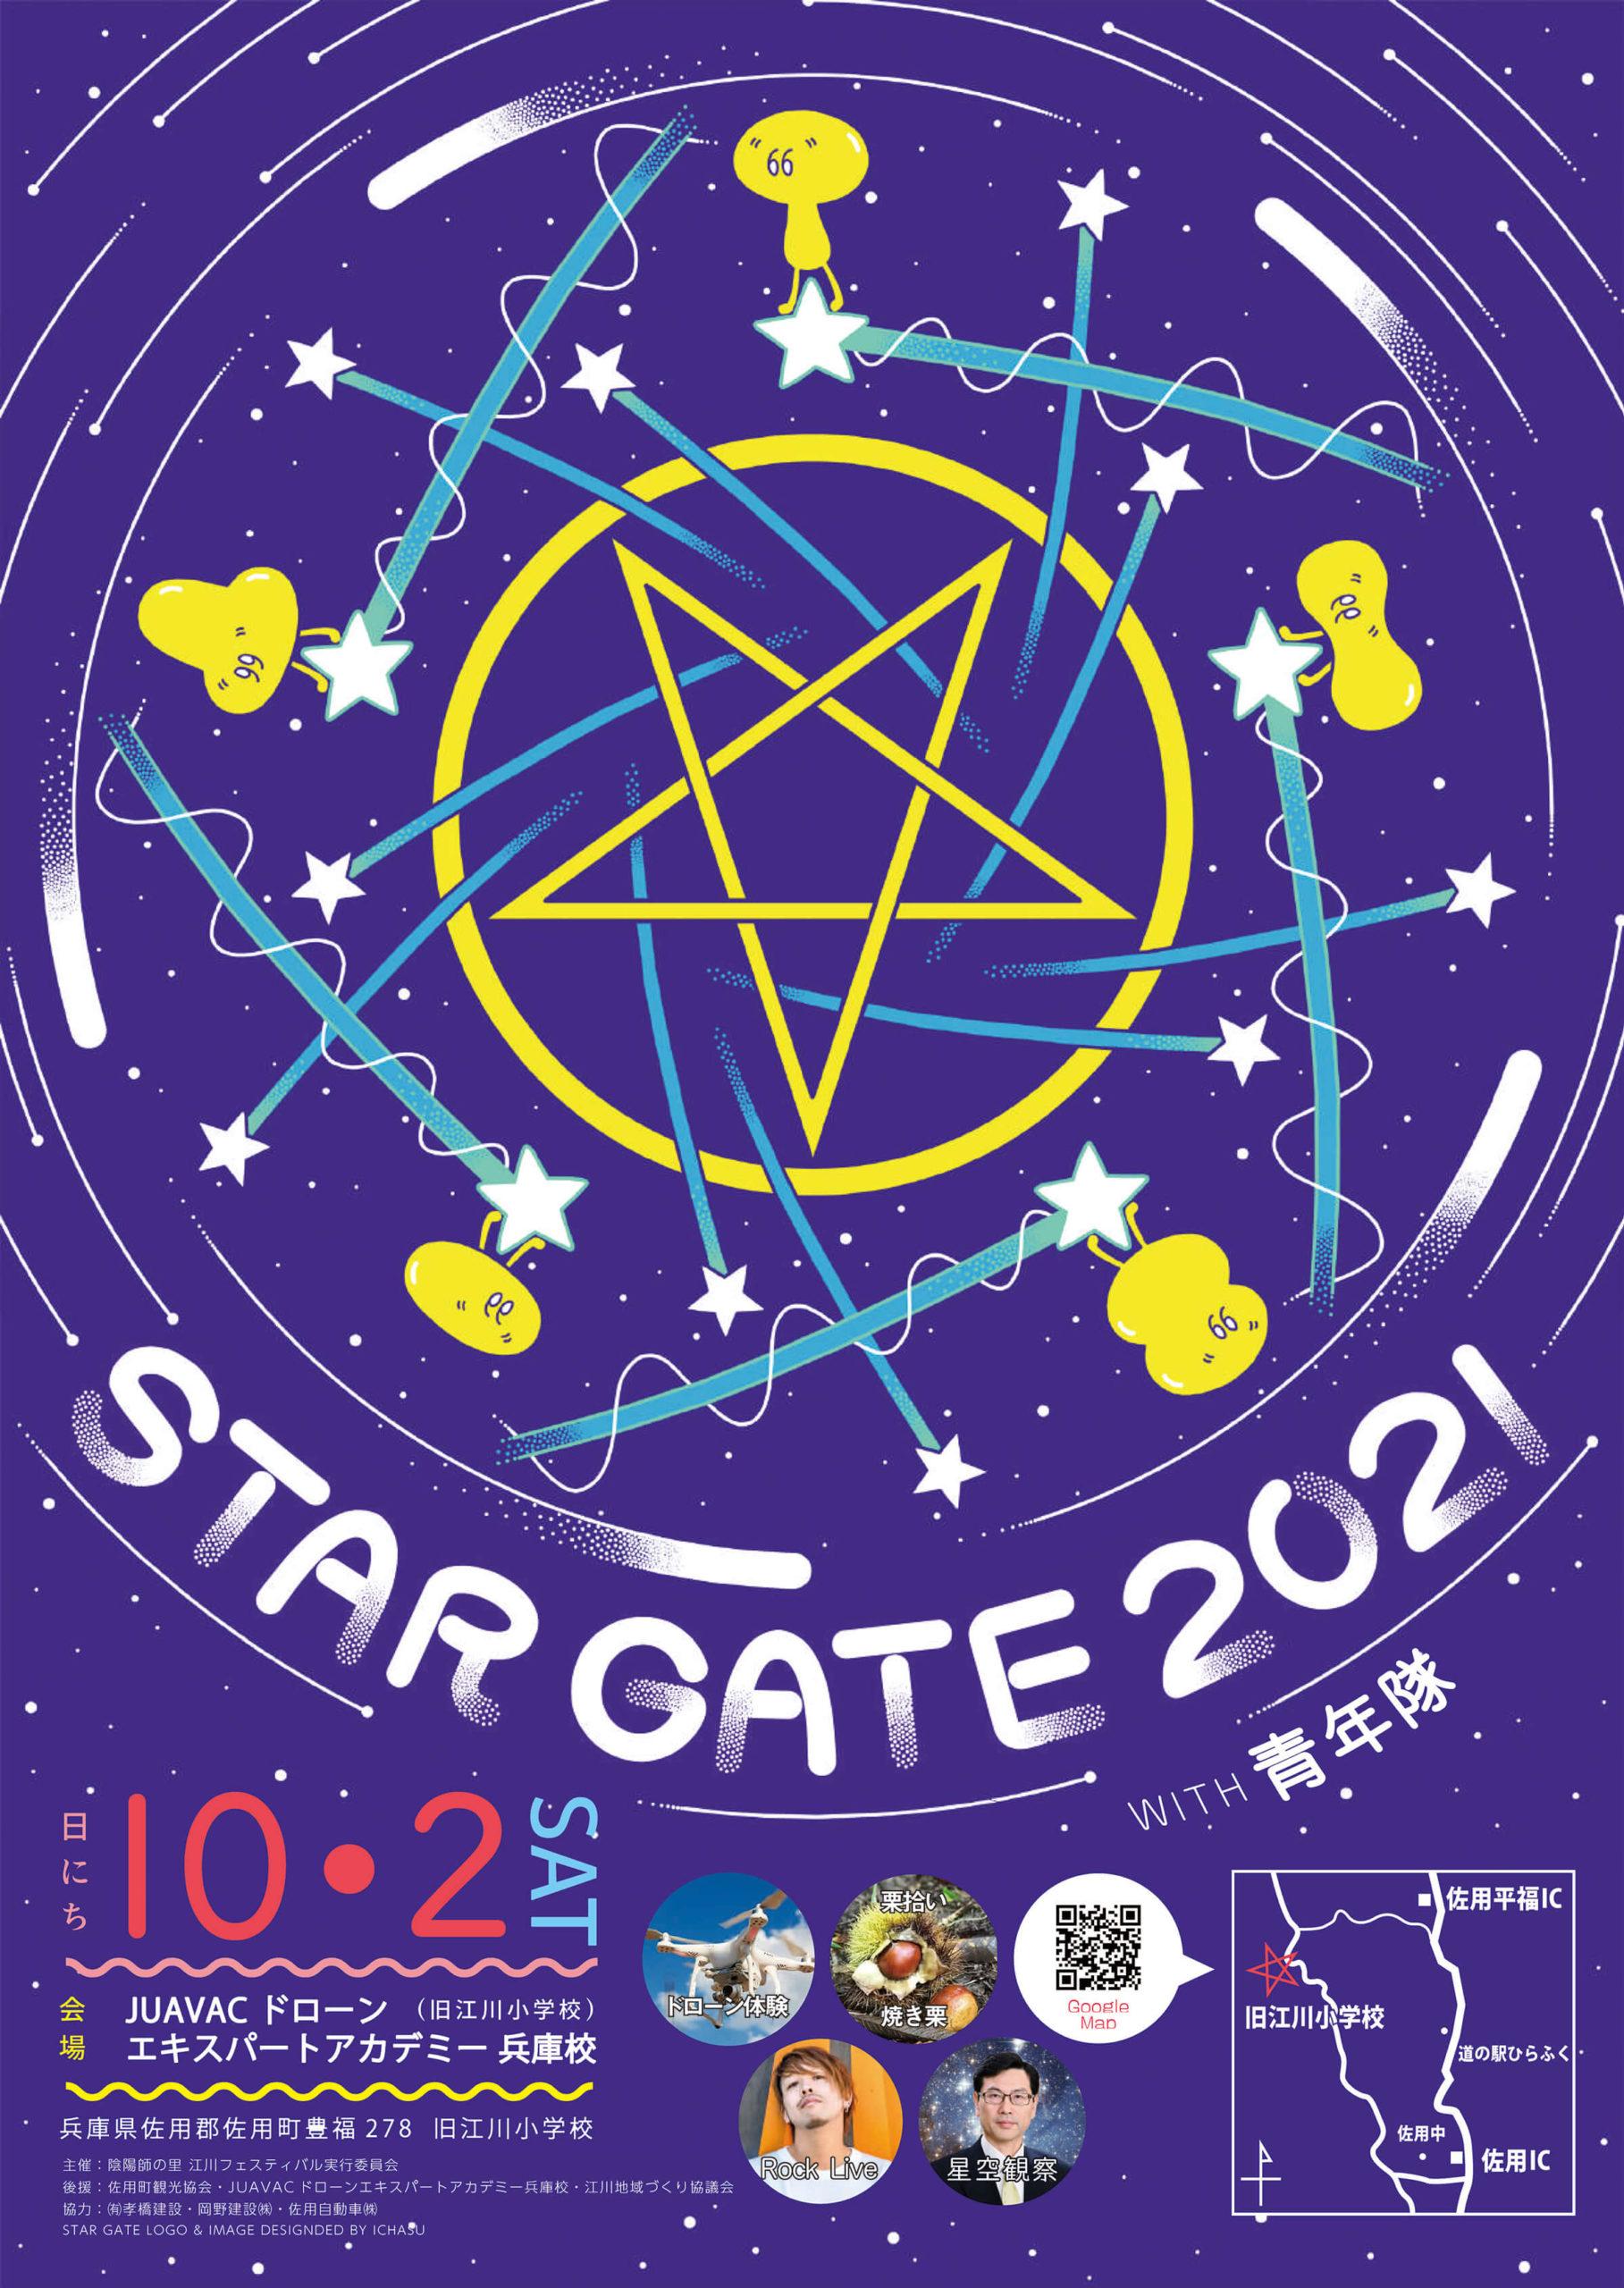 STAR GATE 2021 10/2 (土) @ 佐用町旧江川小学校にて展示販売します